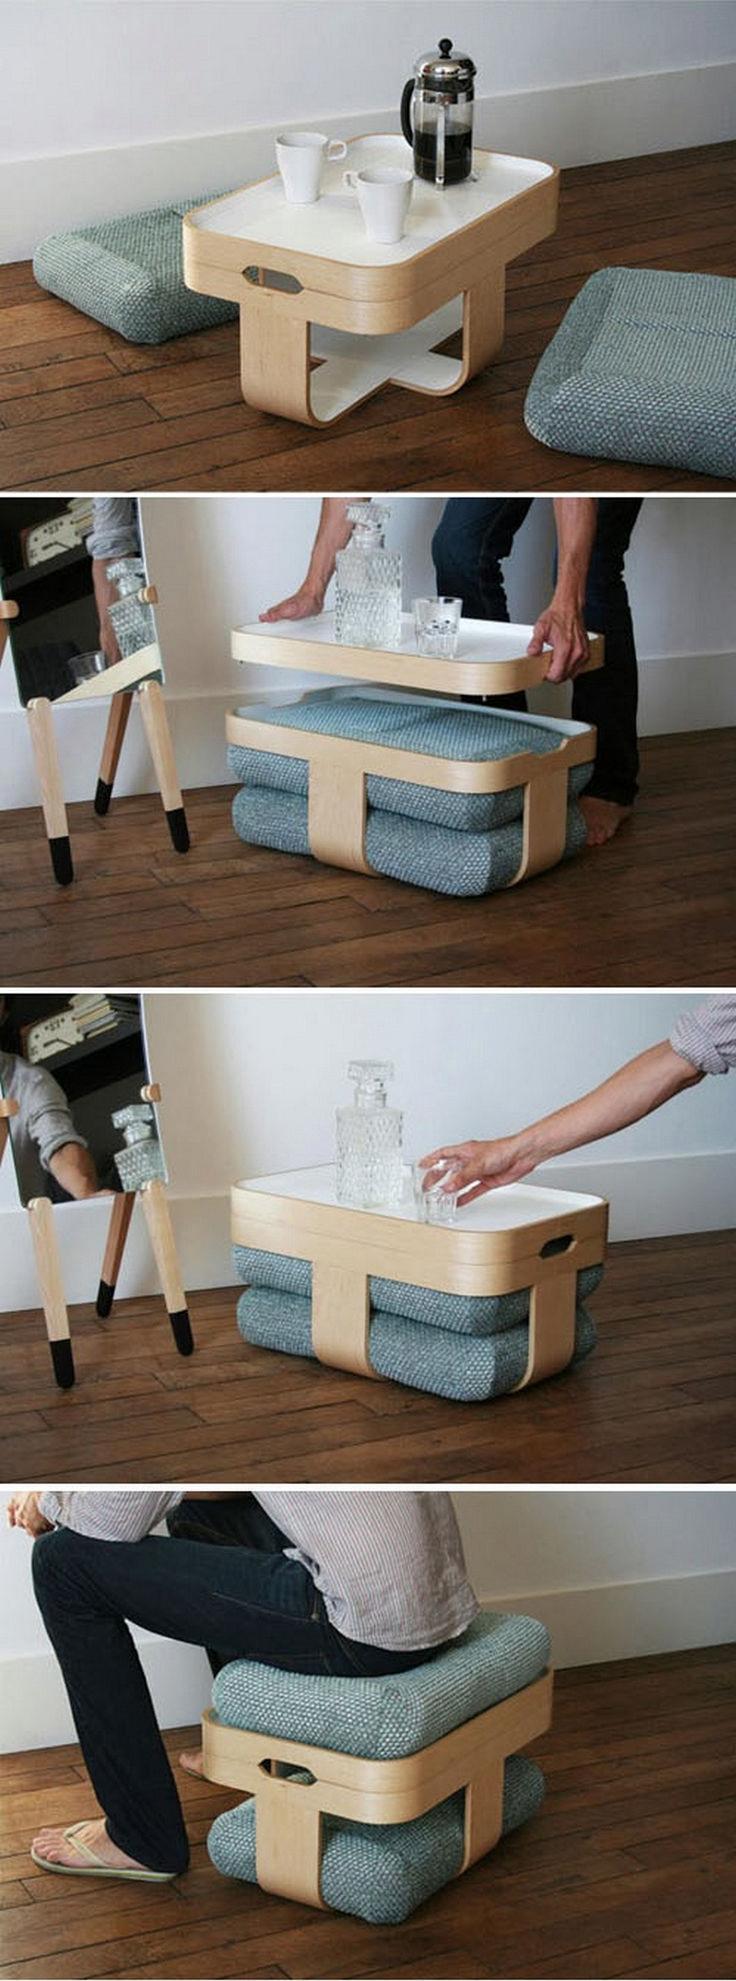 Coolest Modular Furniture Design (15)